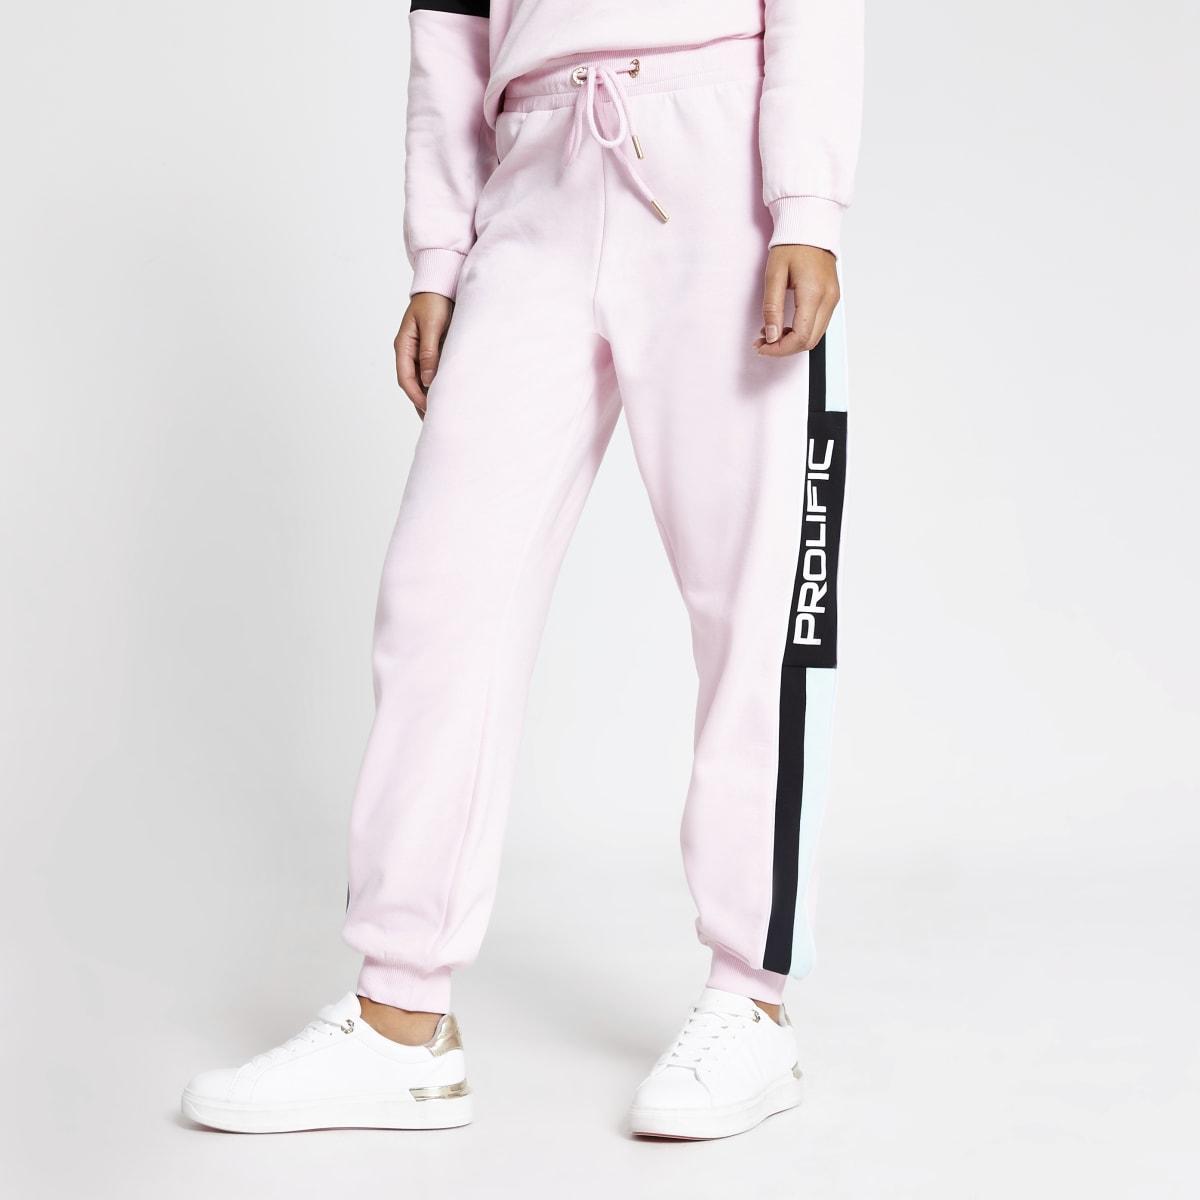 Prolific– Pinke Jogginghose in Blockfarben